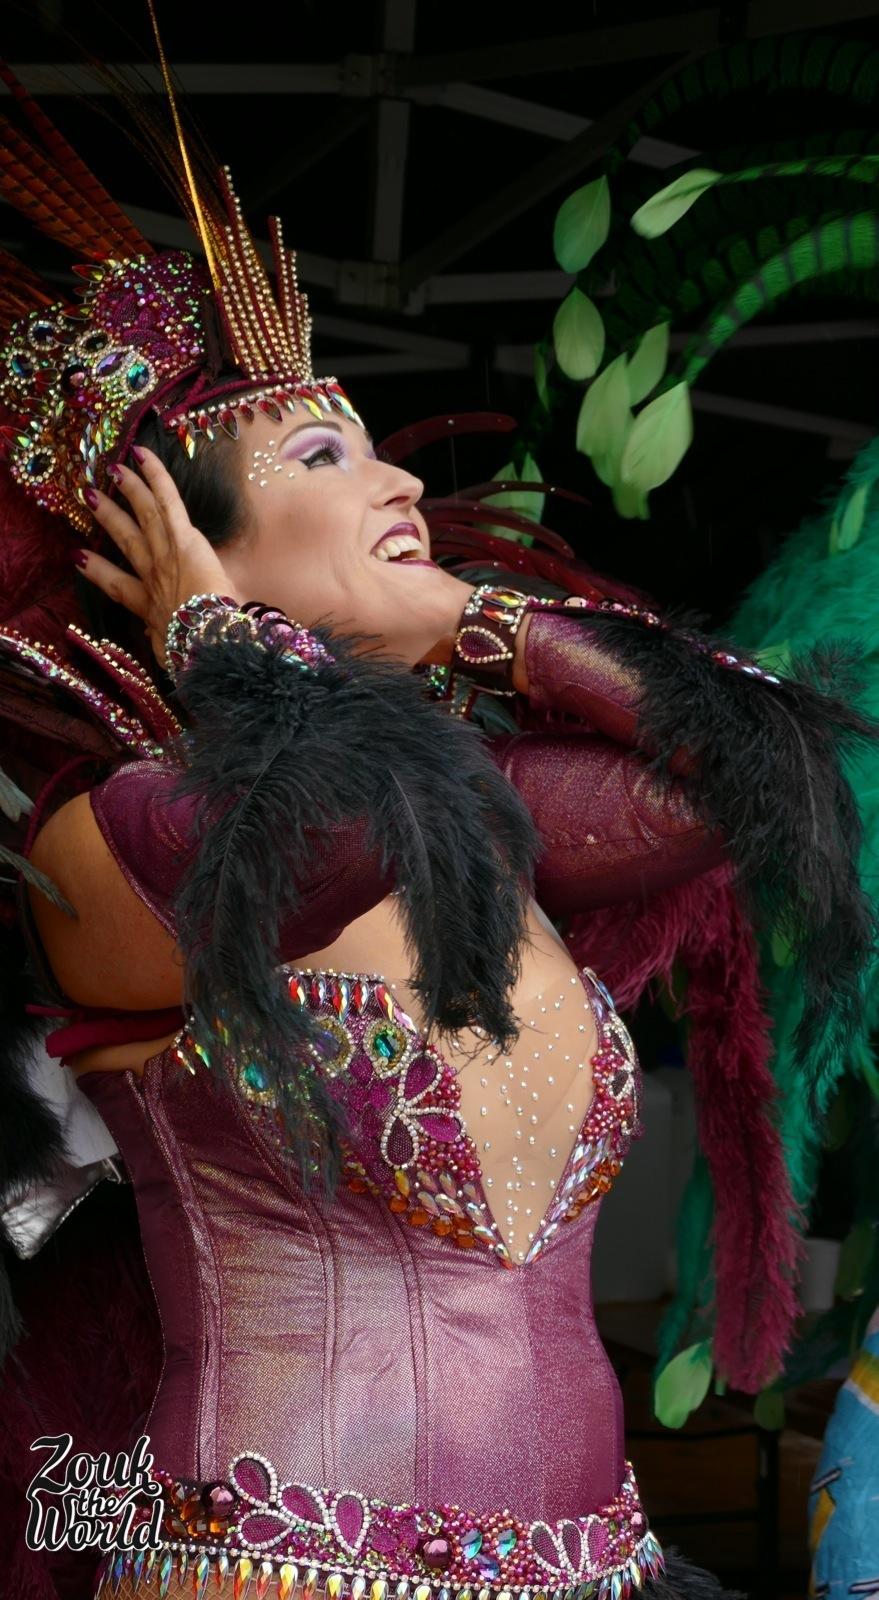 Roseira's dancer seems excited despite the rain